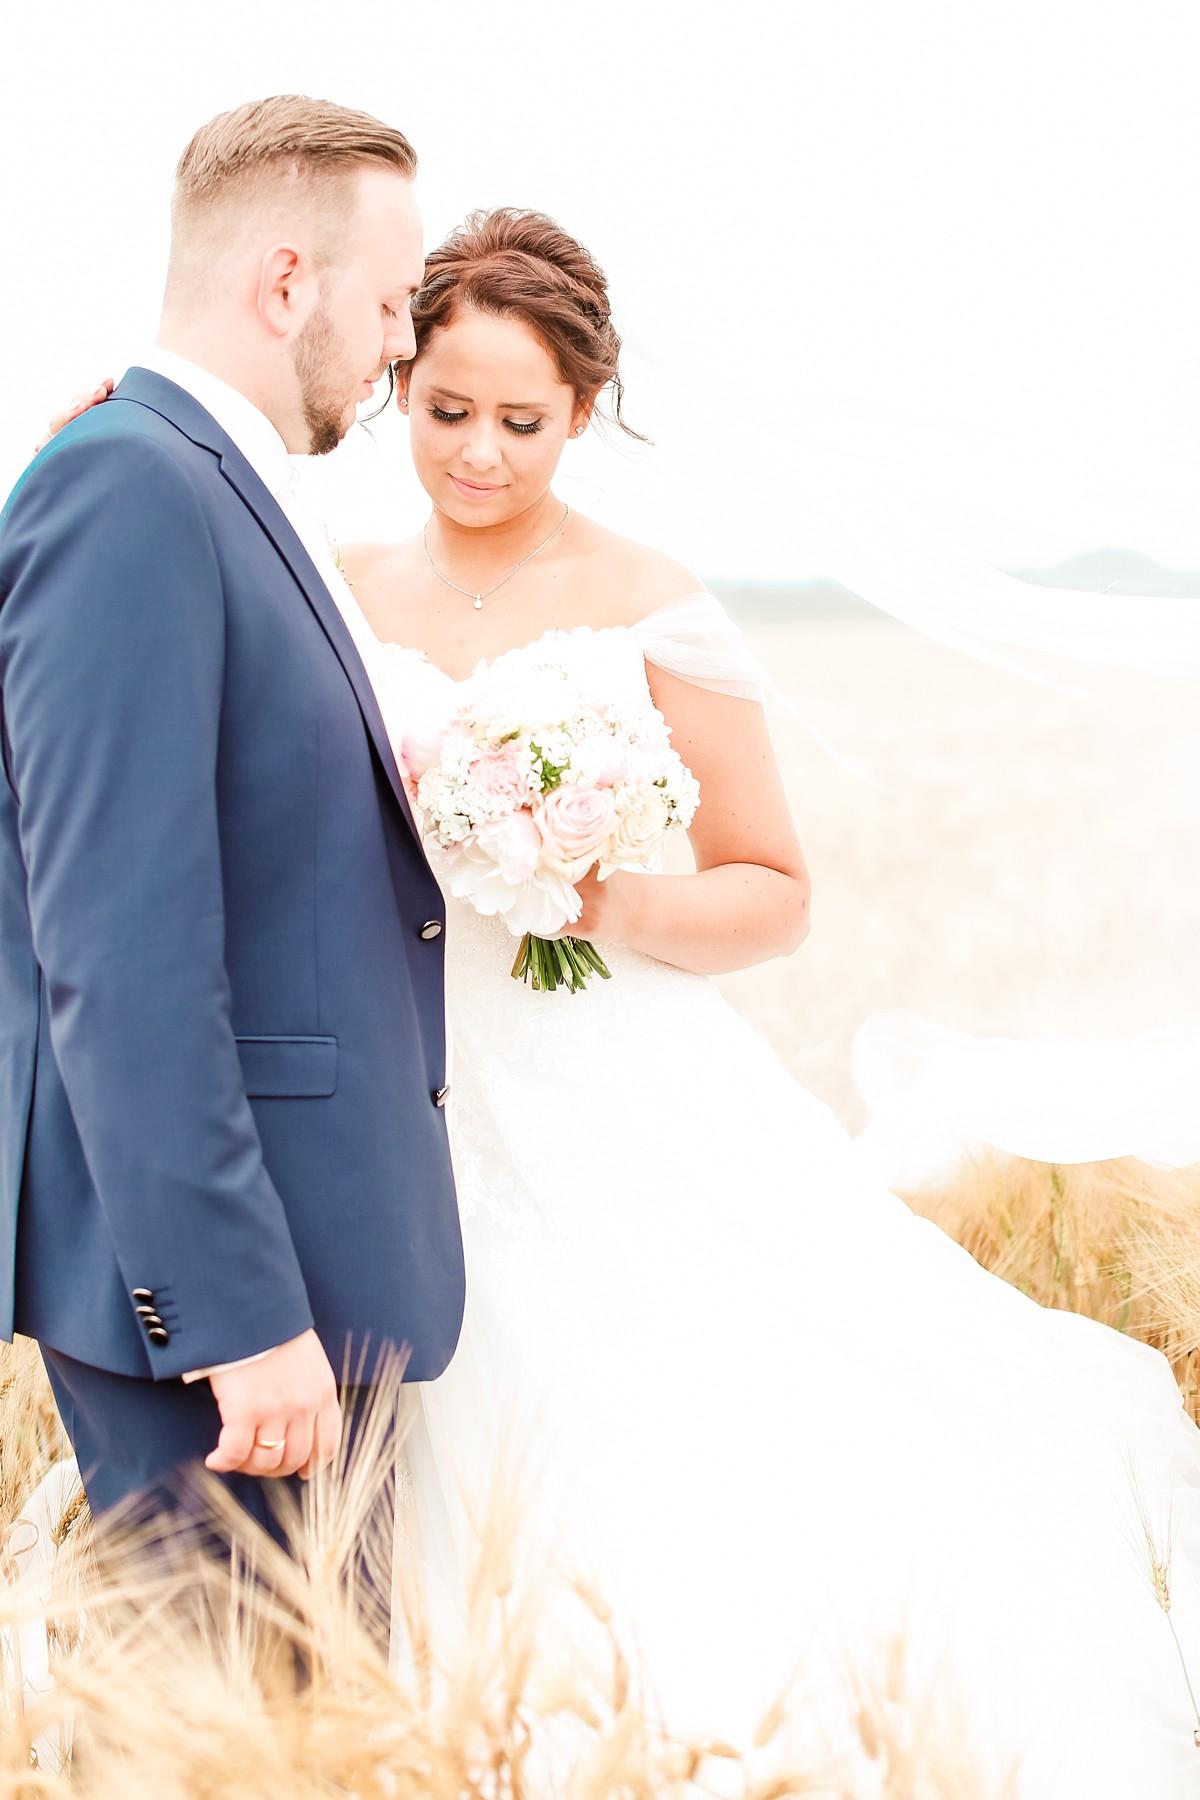 Hochzeitsfotograf-Bünde-Hücker-Moor-Fotograf-Moor-Ranch_0175